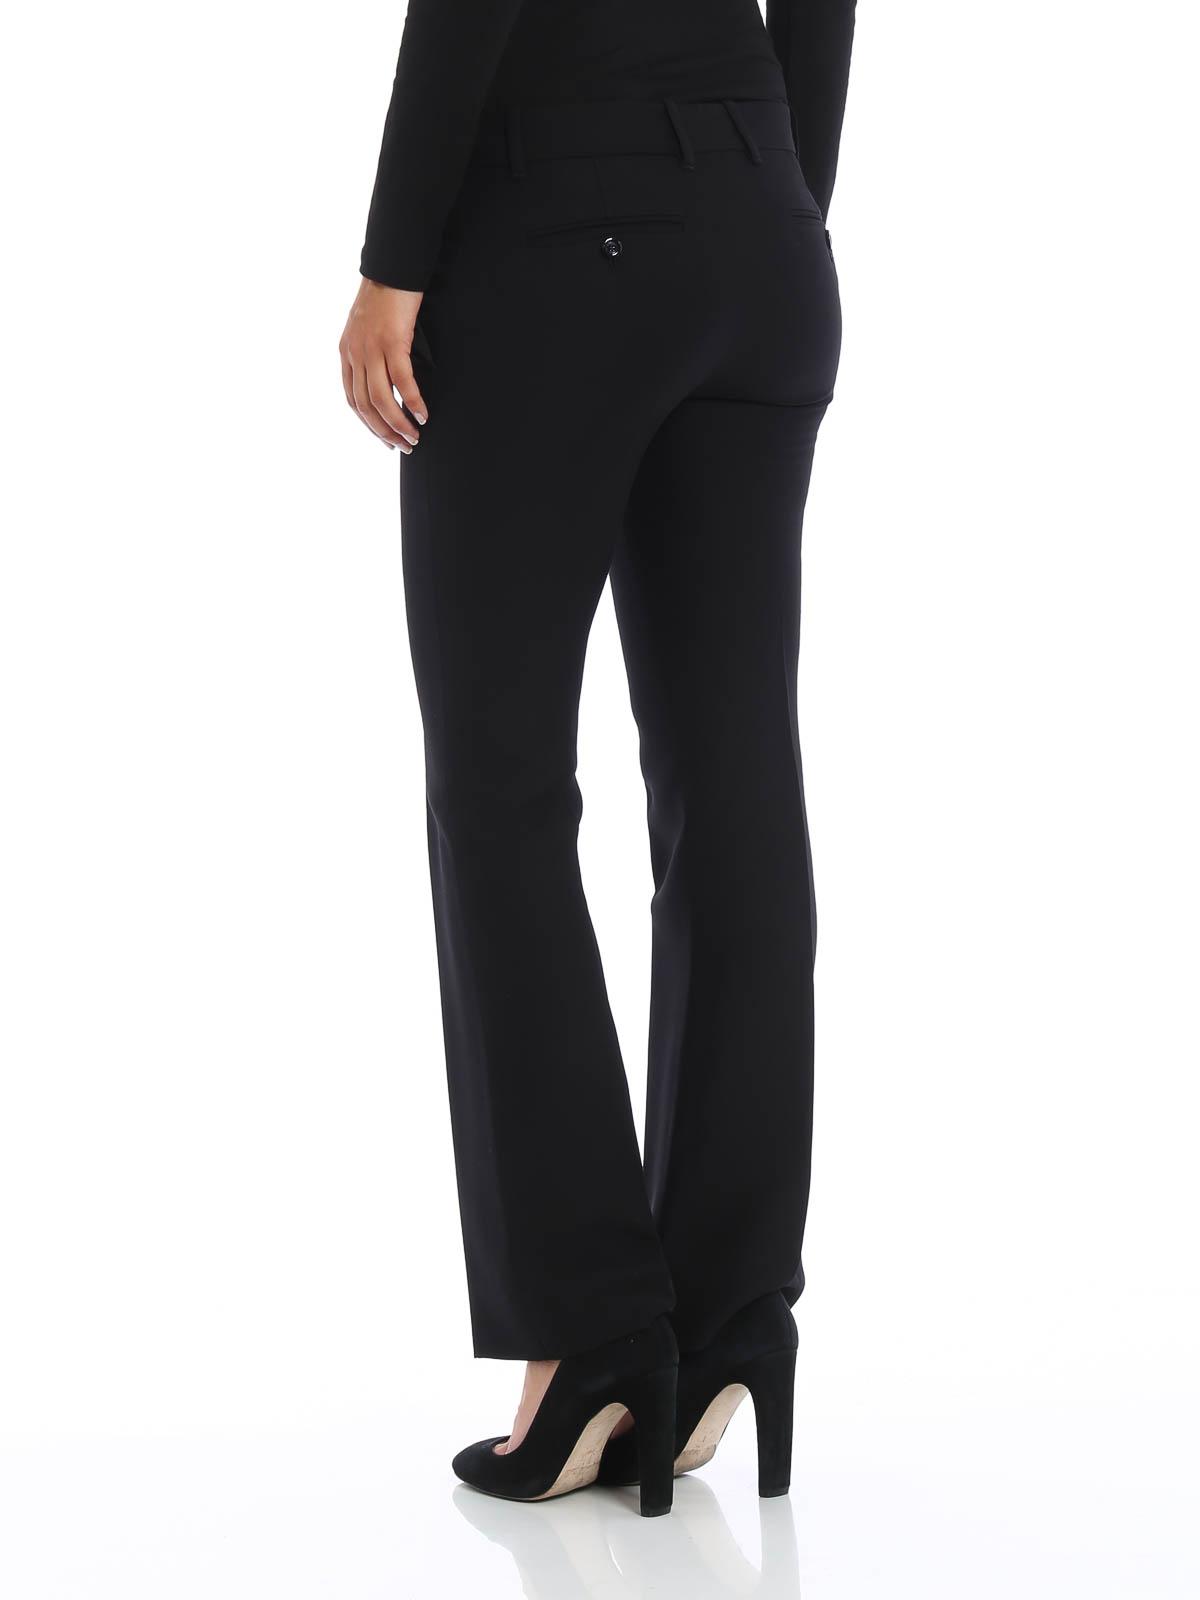 Gucci Pantalon De Vestir Negro Para Mujer Pantalones De Sastreria 430519zhm881000